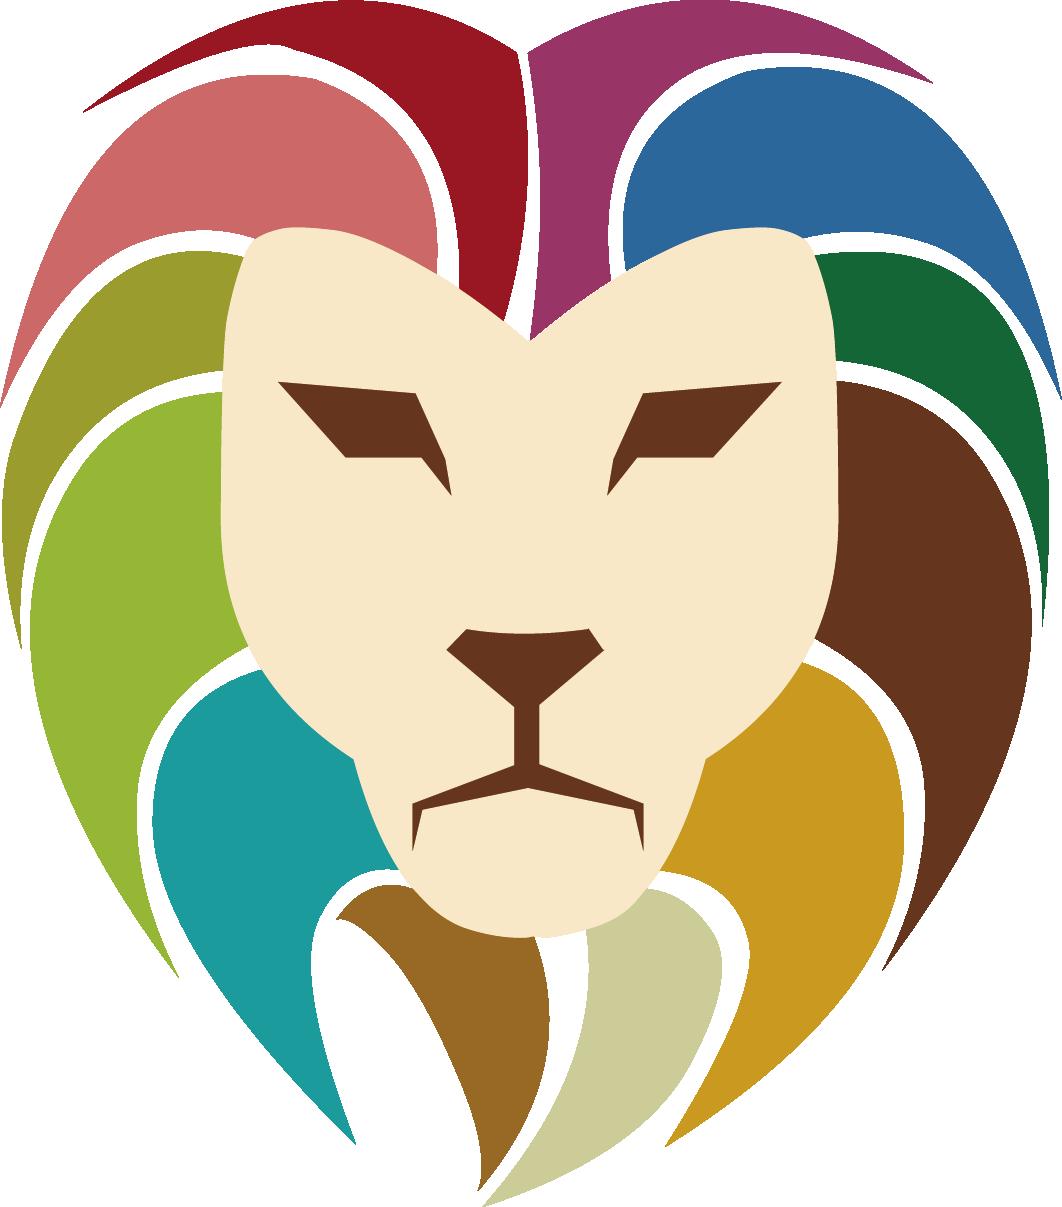 Plenty Lions GmbH